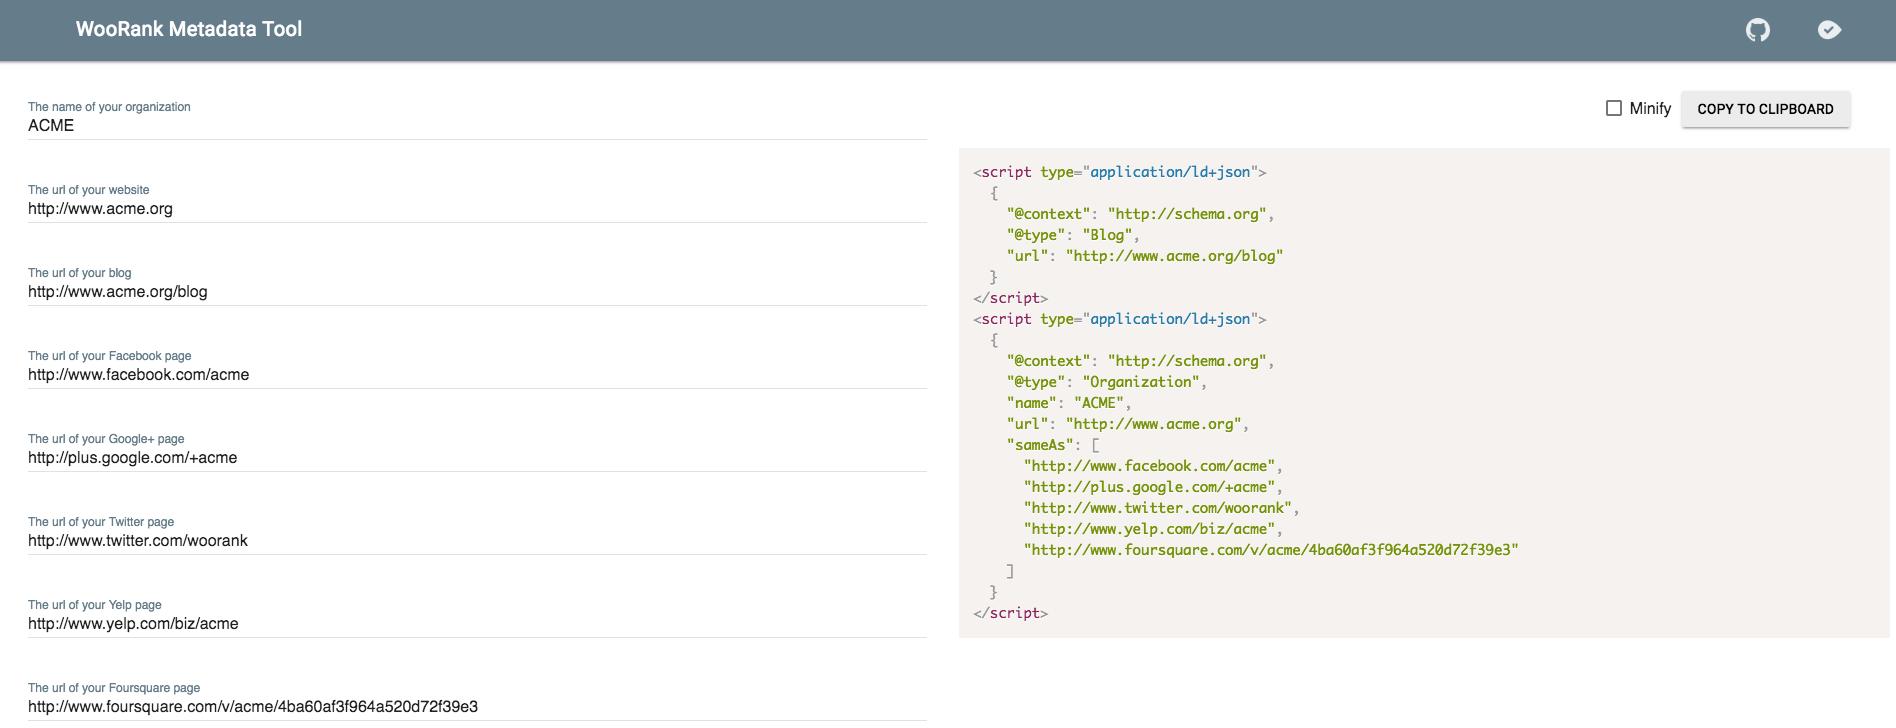 WooRank Metadata Tool generated markup